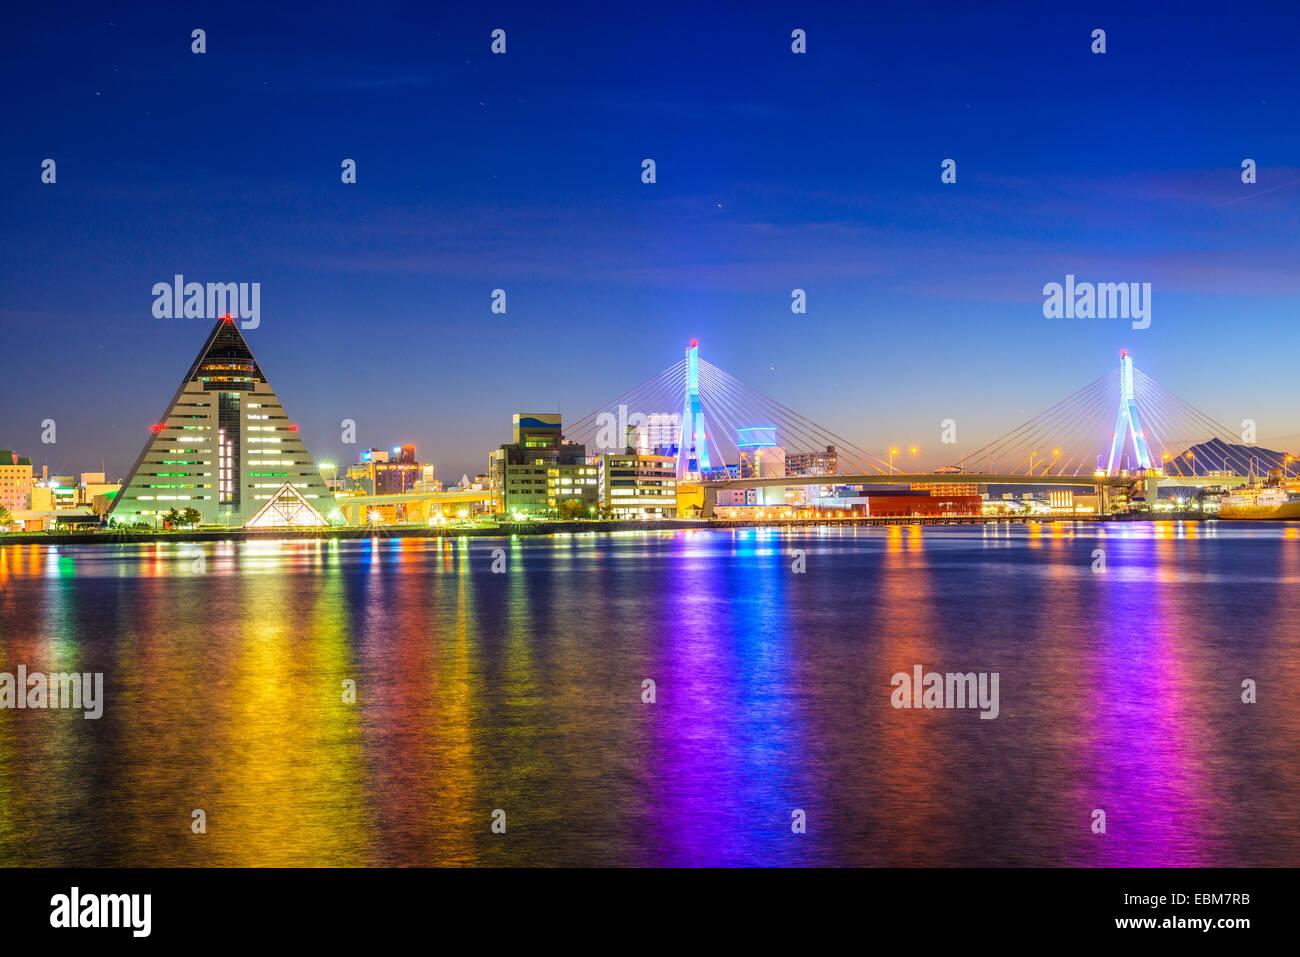 La Ville d'Aomori, la Préfecture d'Aomori, Japon night skyline. Photo Stock